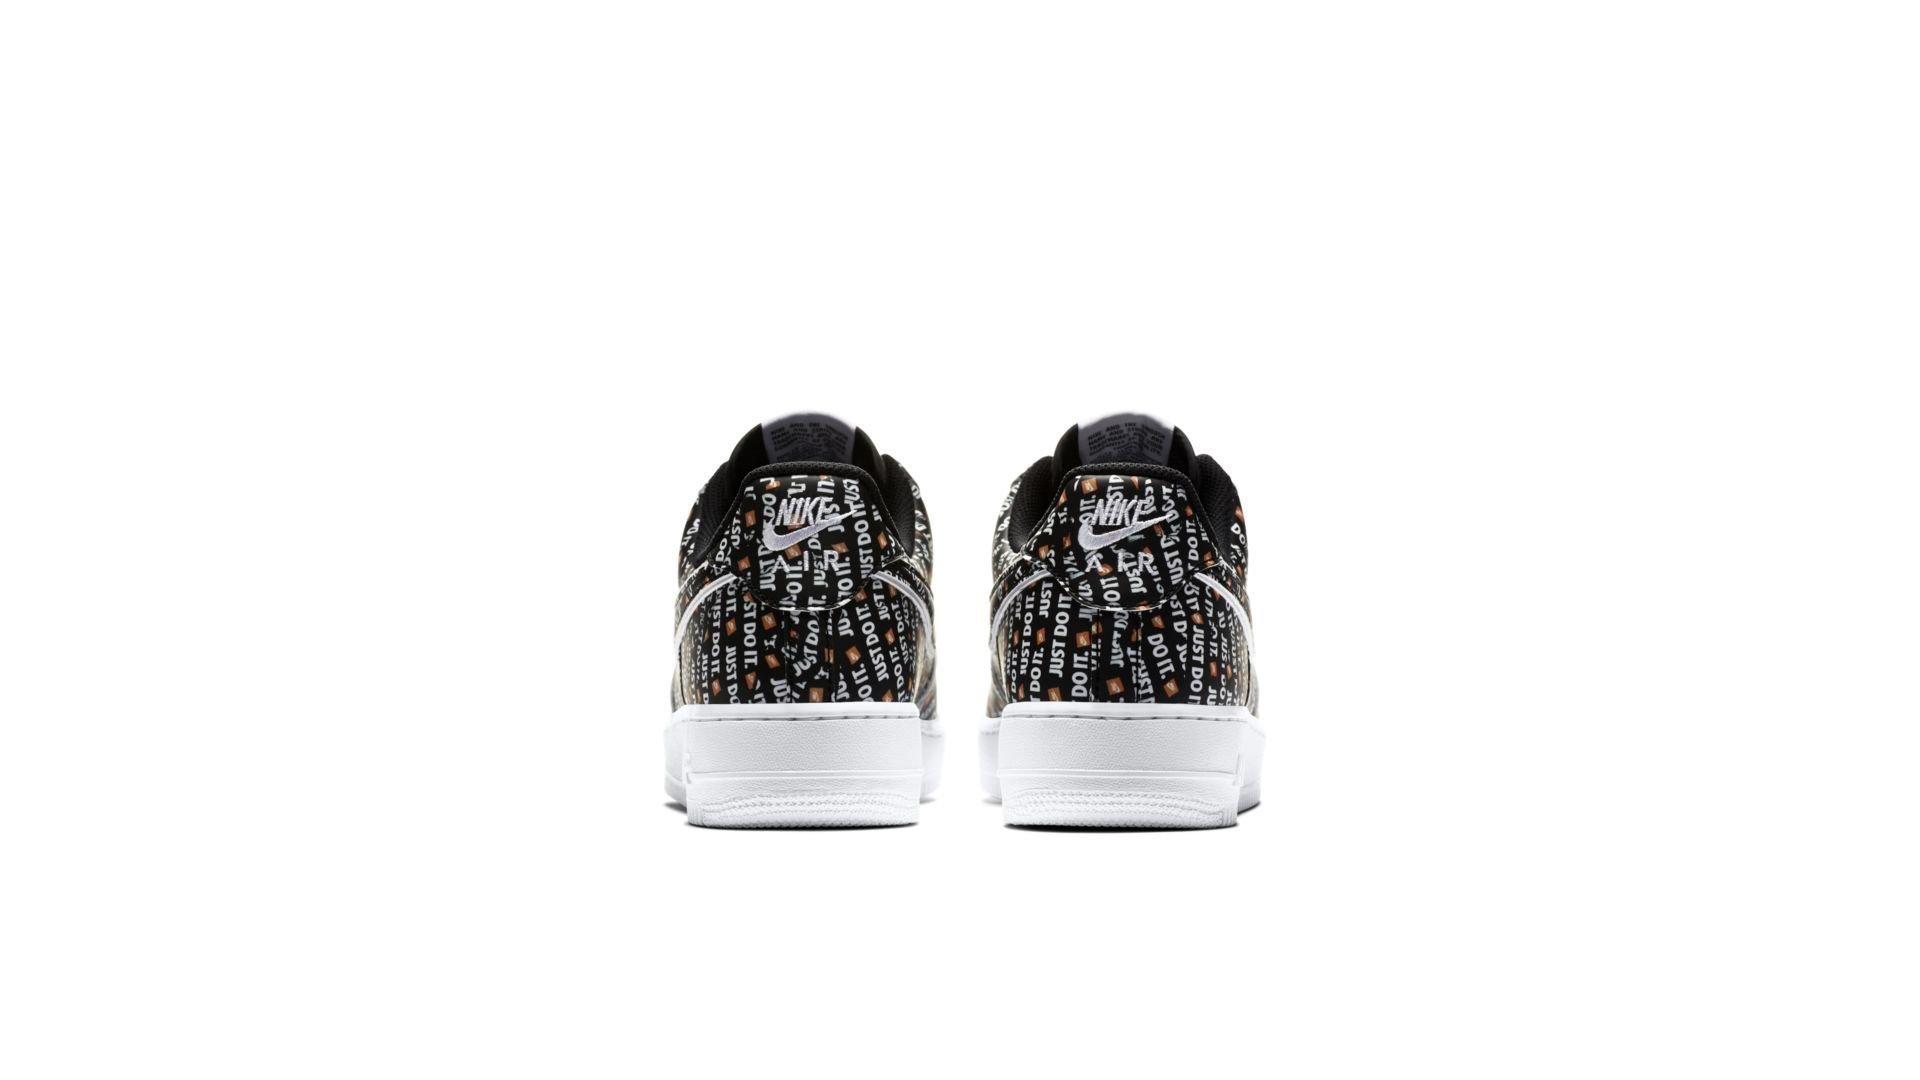 Nike Air Force 1 '07 LV8 'Black' (AO6296-001)